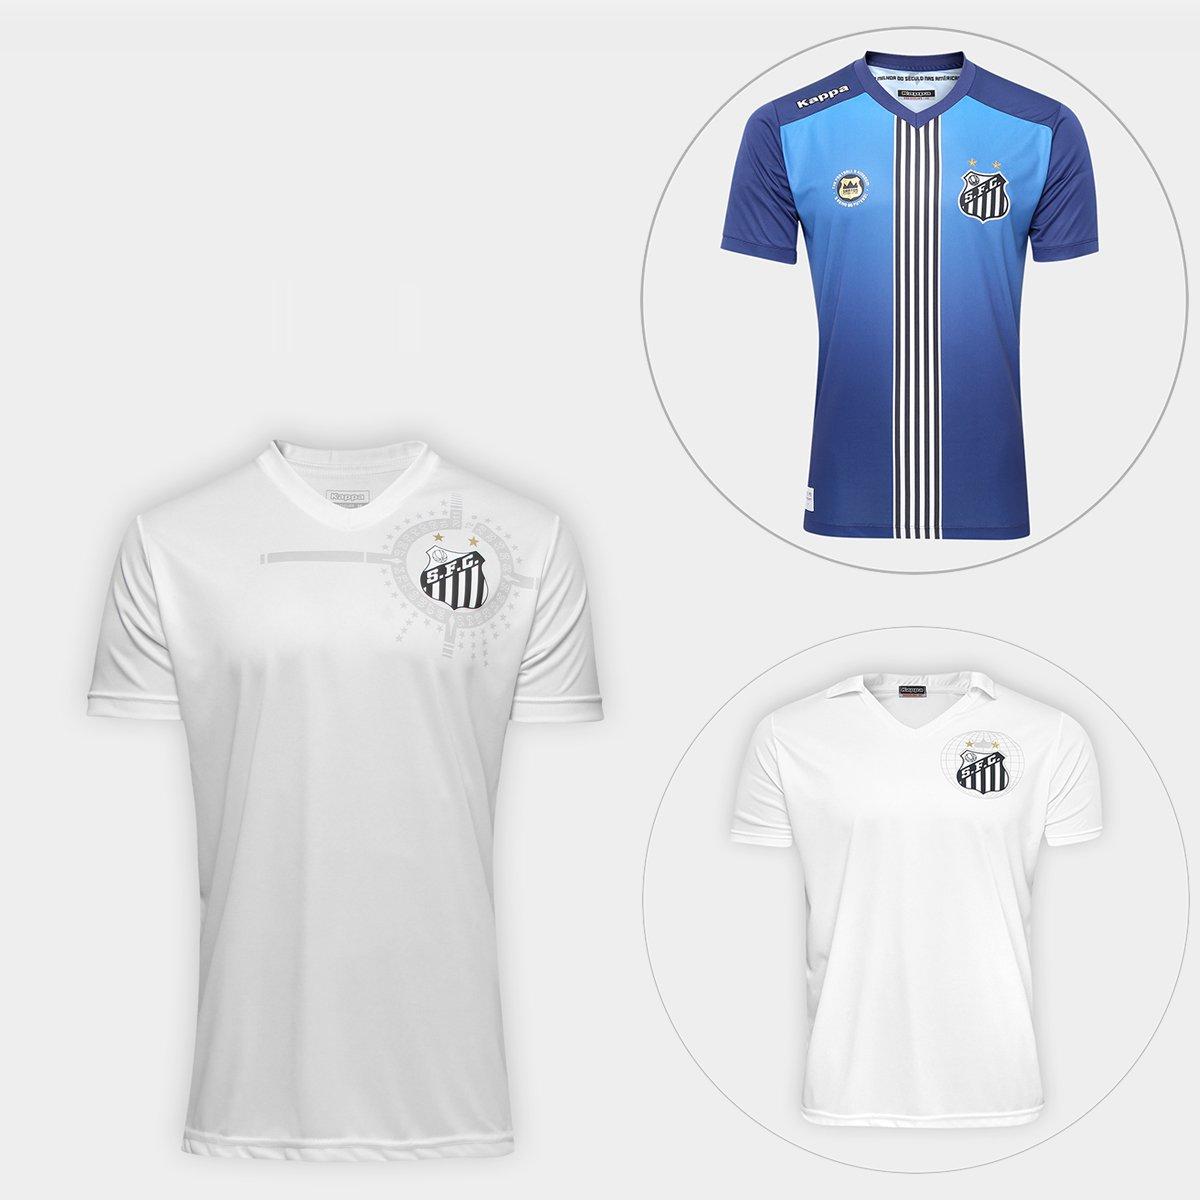 Kit Camisa Santos América 2011 + Camisa Santos 2010 + Camisa III 16 -  Compre Agora  a83f6b274ed49